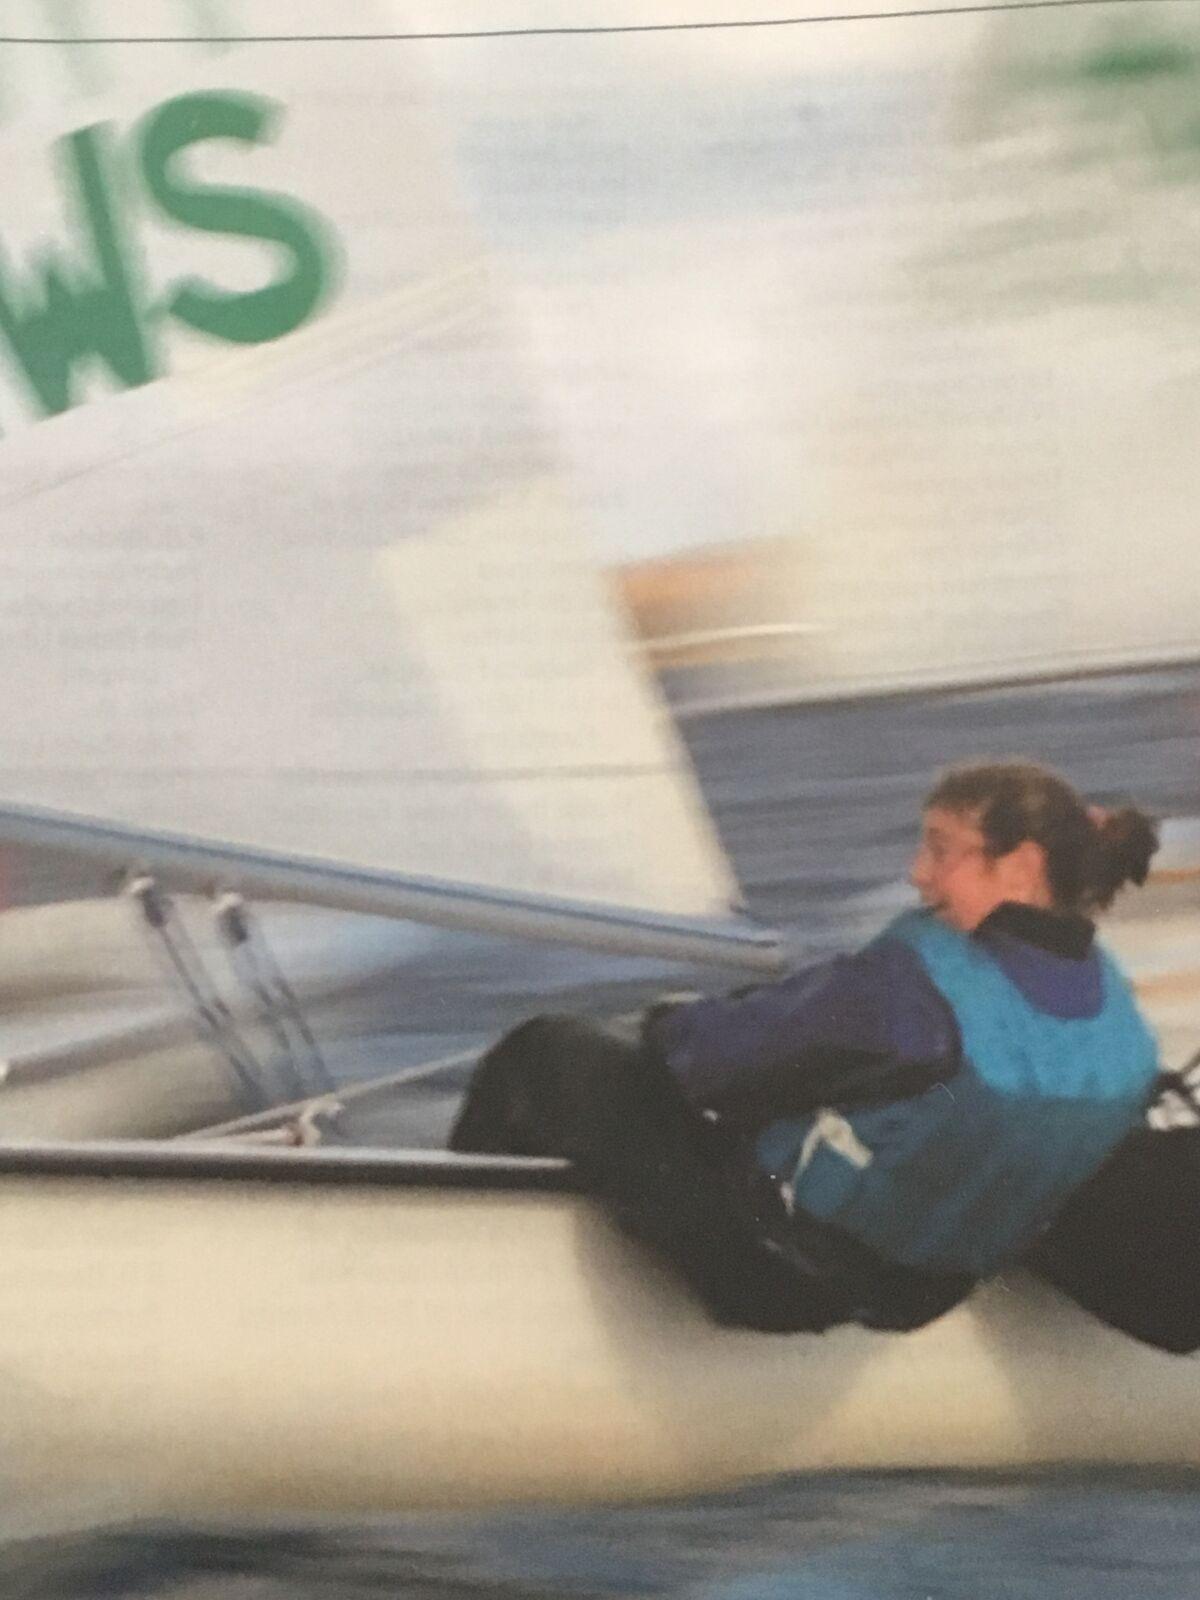 Hobart and William Smith College Sailing Team - Sarah racing.jpg